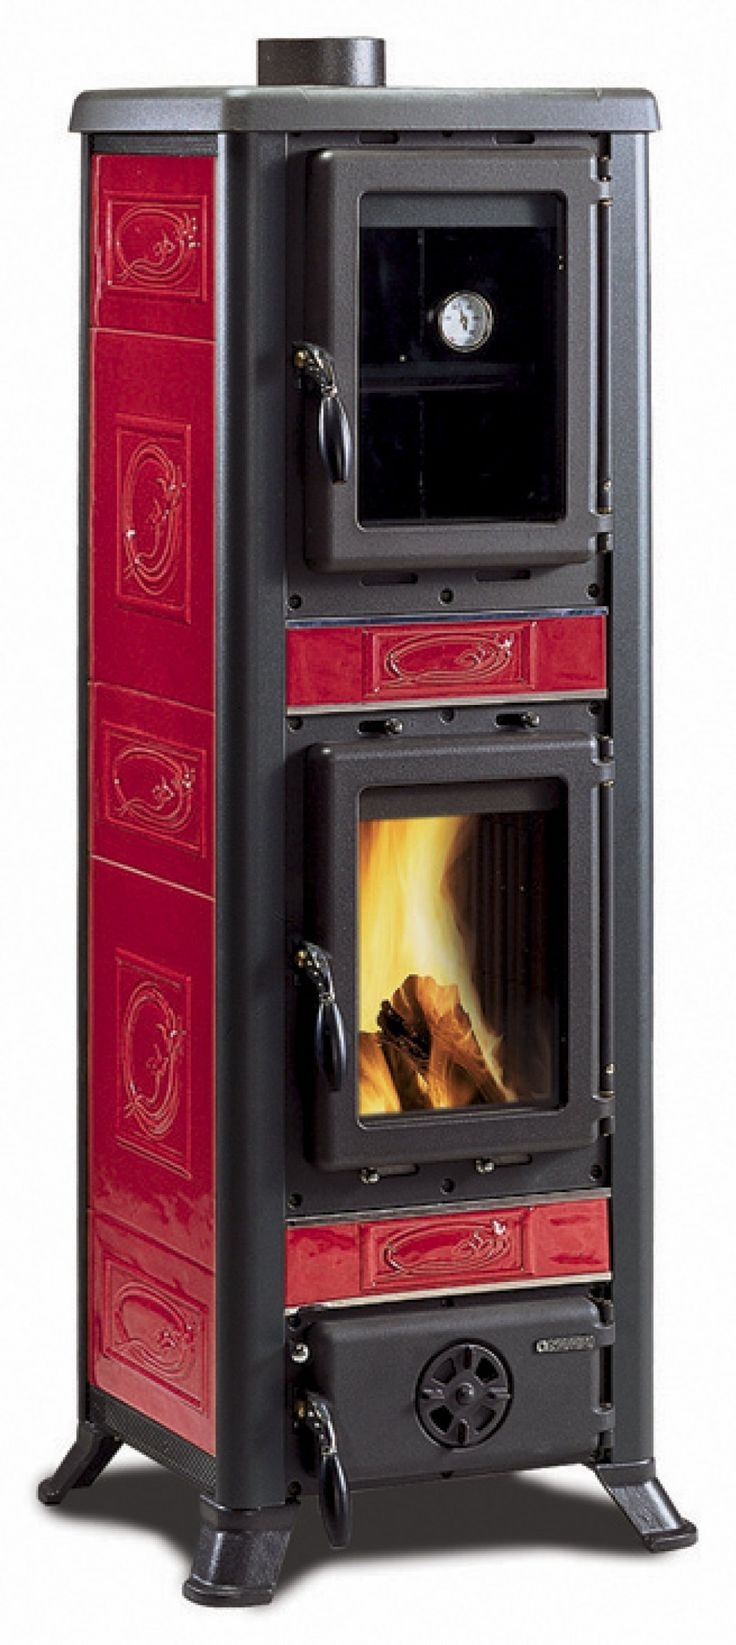 20 best diesel stove images on pinterest diesel diesel. Black Bedroom Furniture Sets. Home Design Ideas